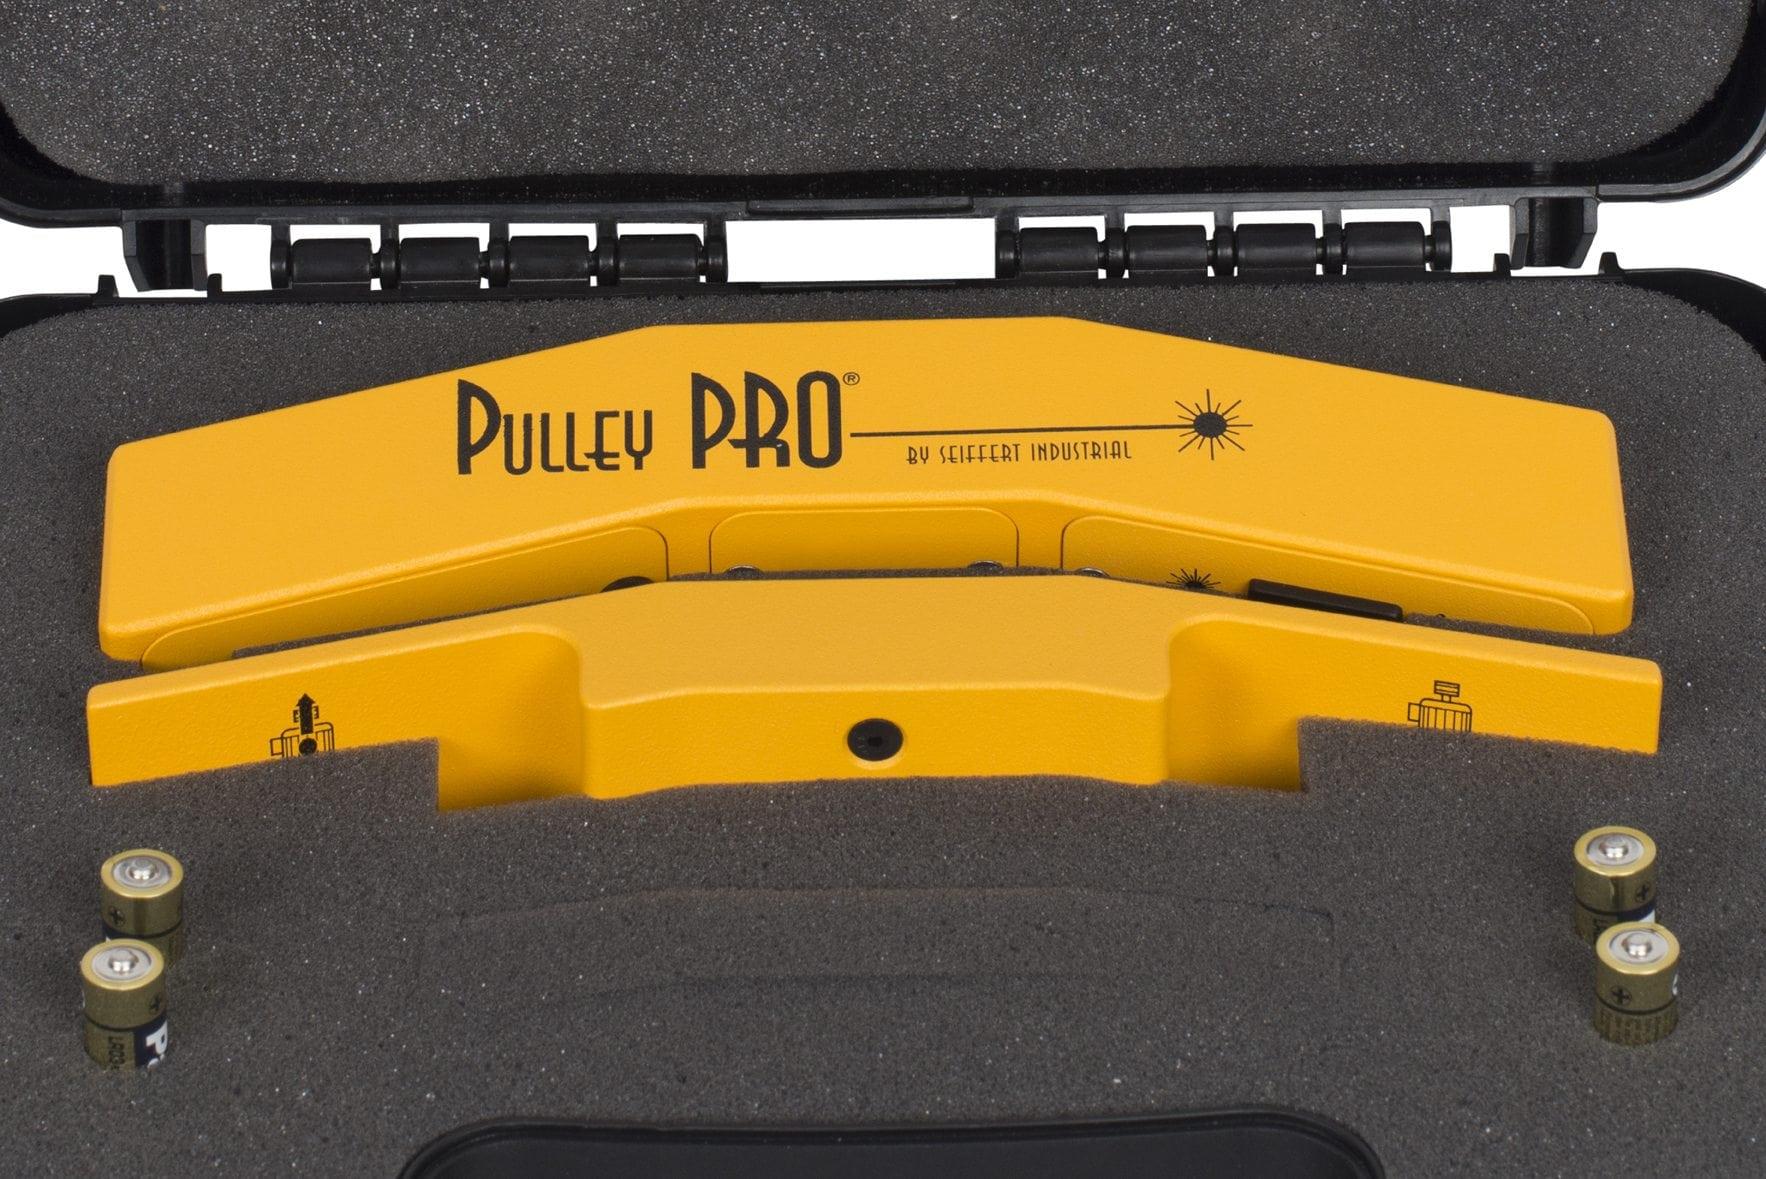 V Belt Alignment Tools | Align Drive Pulleys Quickly